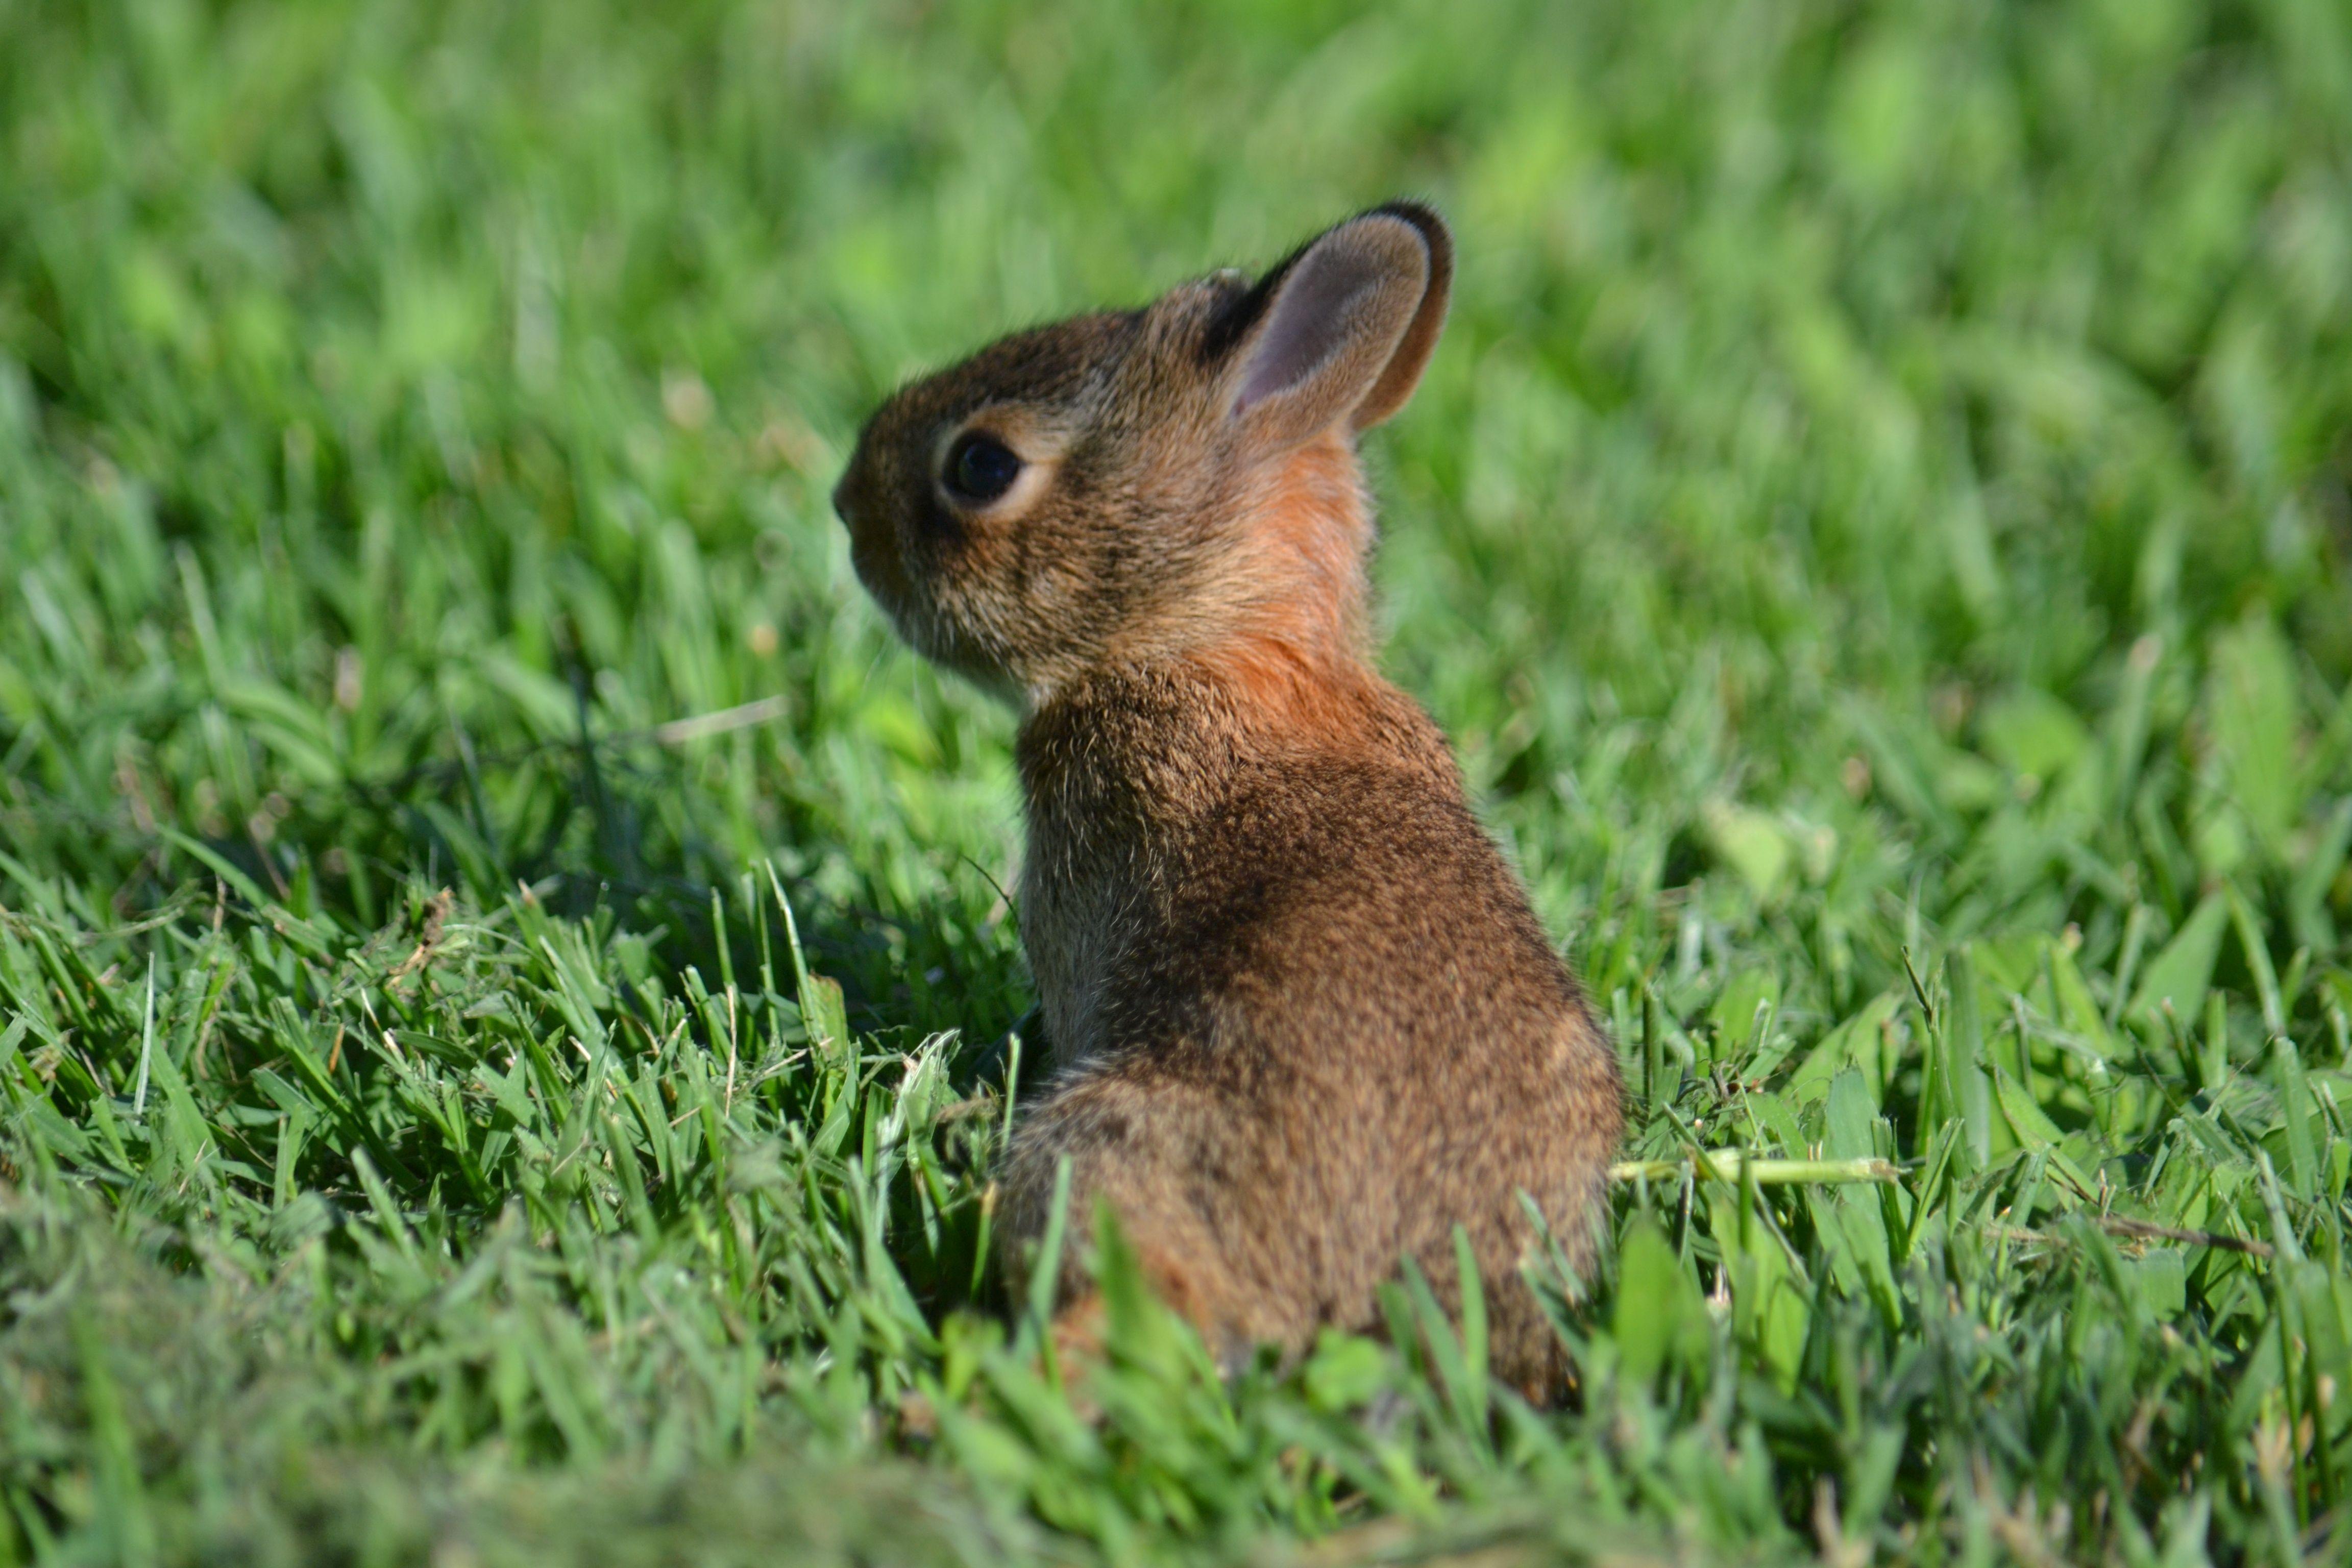 #LeahMariePhotography #baby #bunny #summer #noedits #adorable